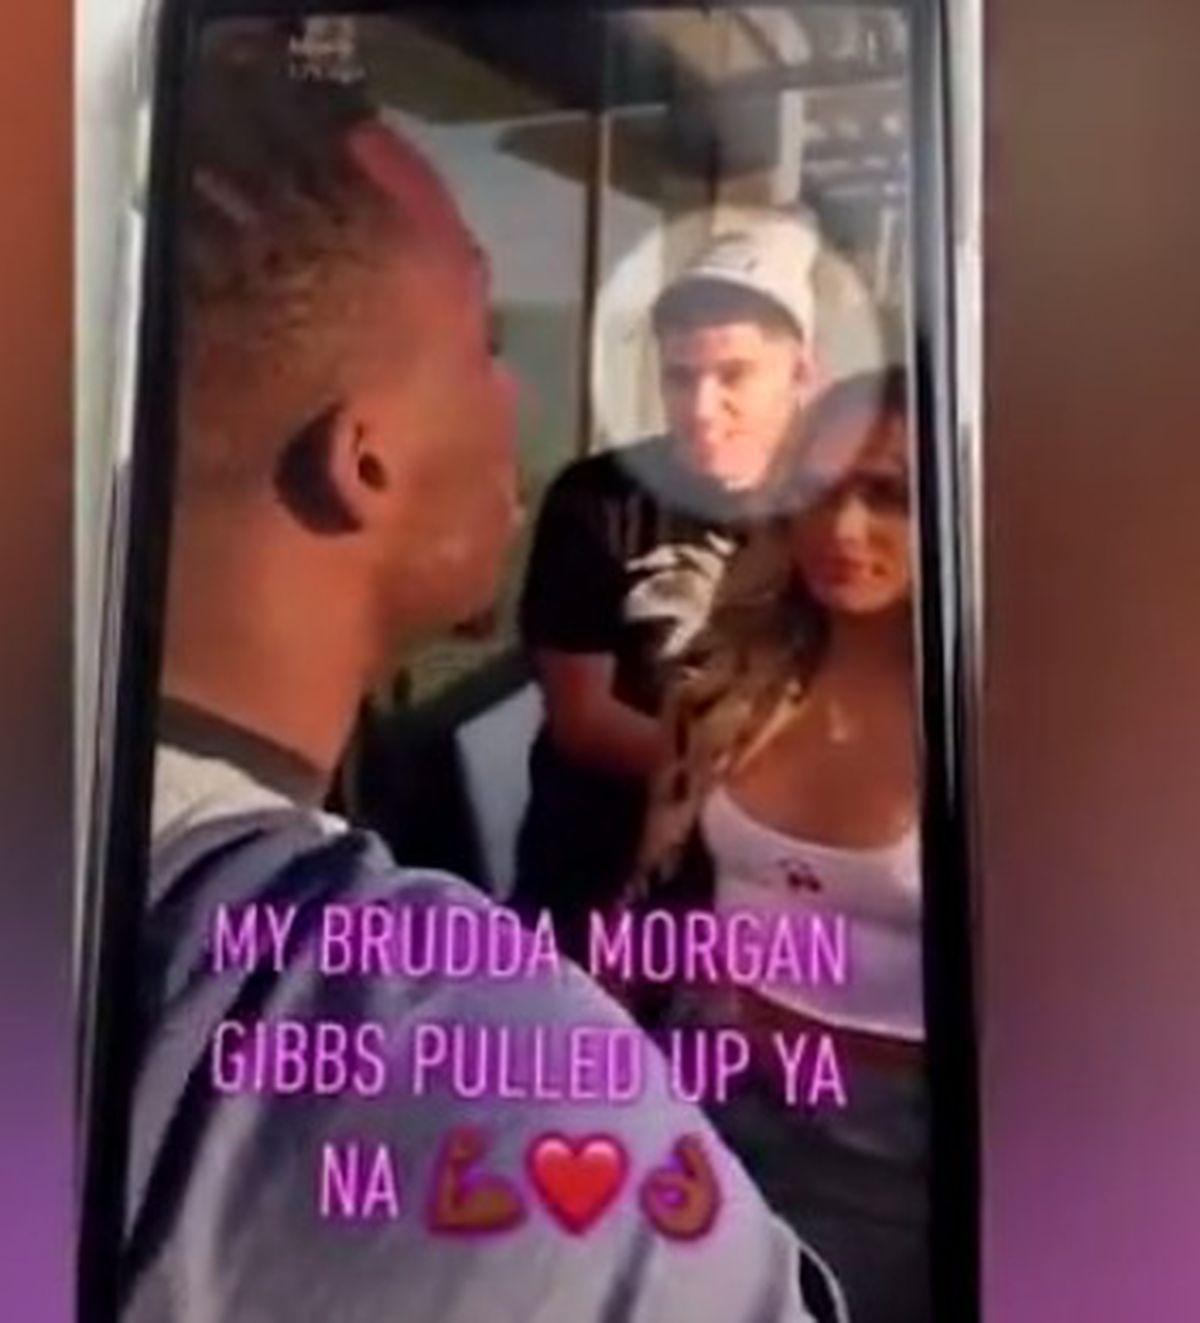 Morgan Gibbs-White at the party in London (via Snapchat)